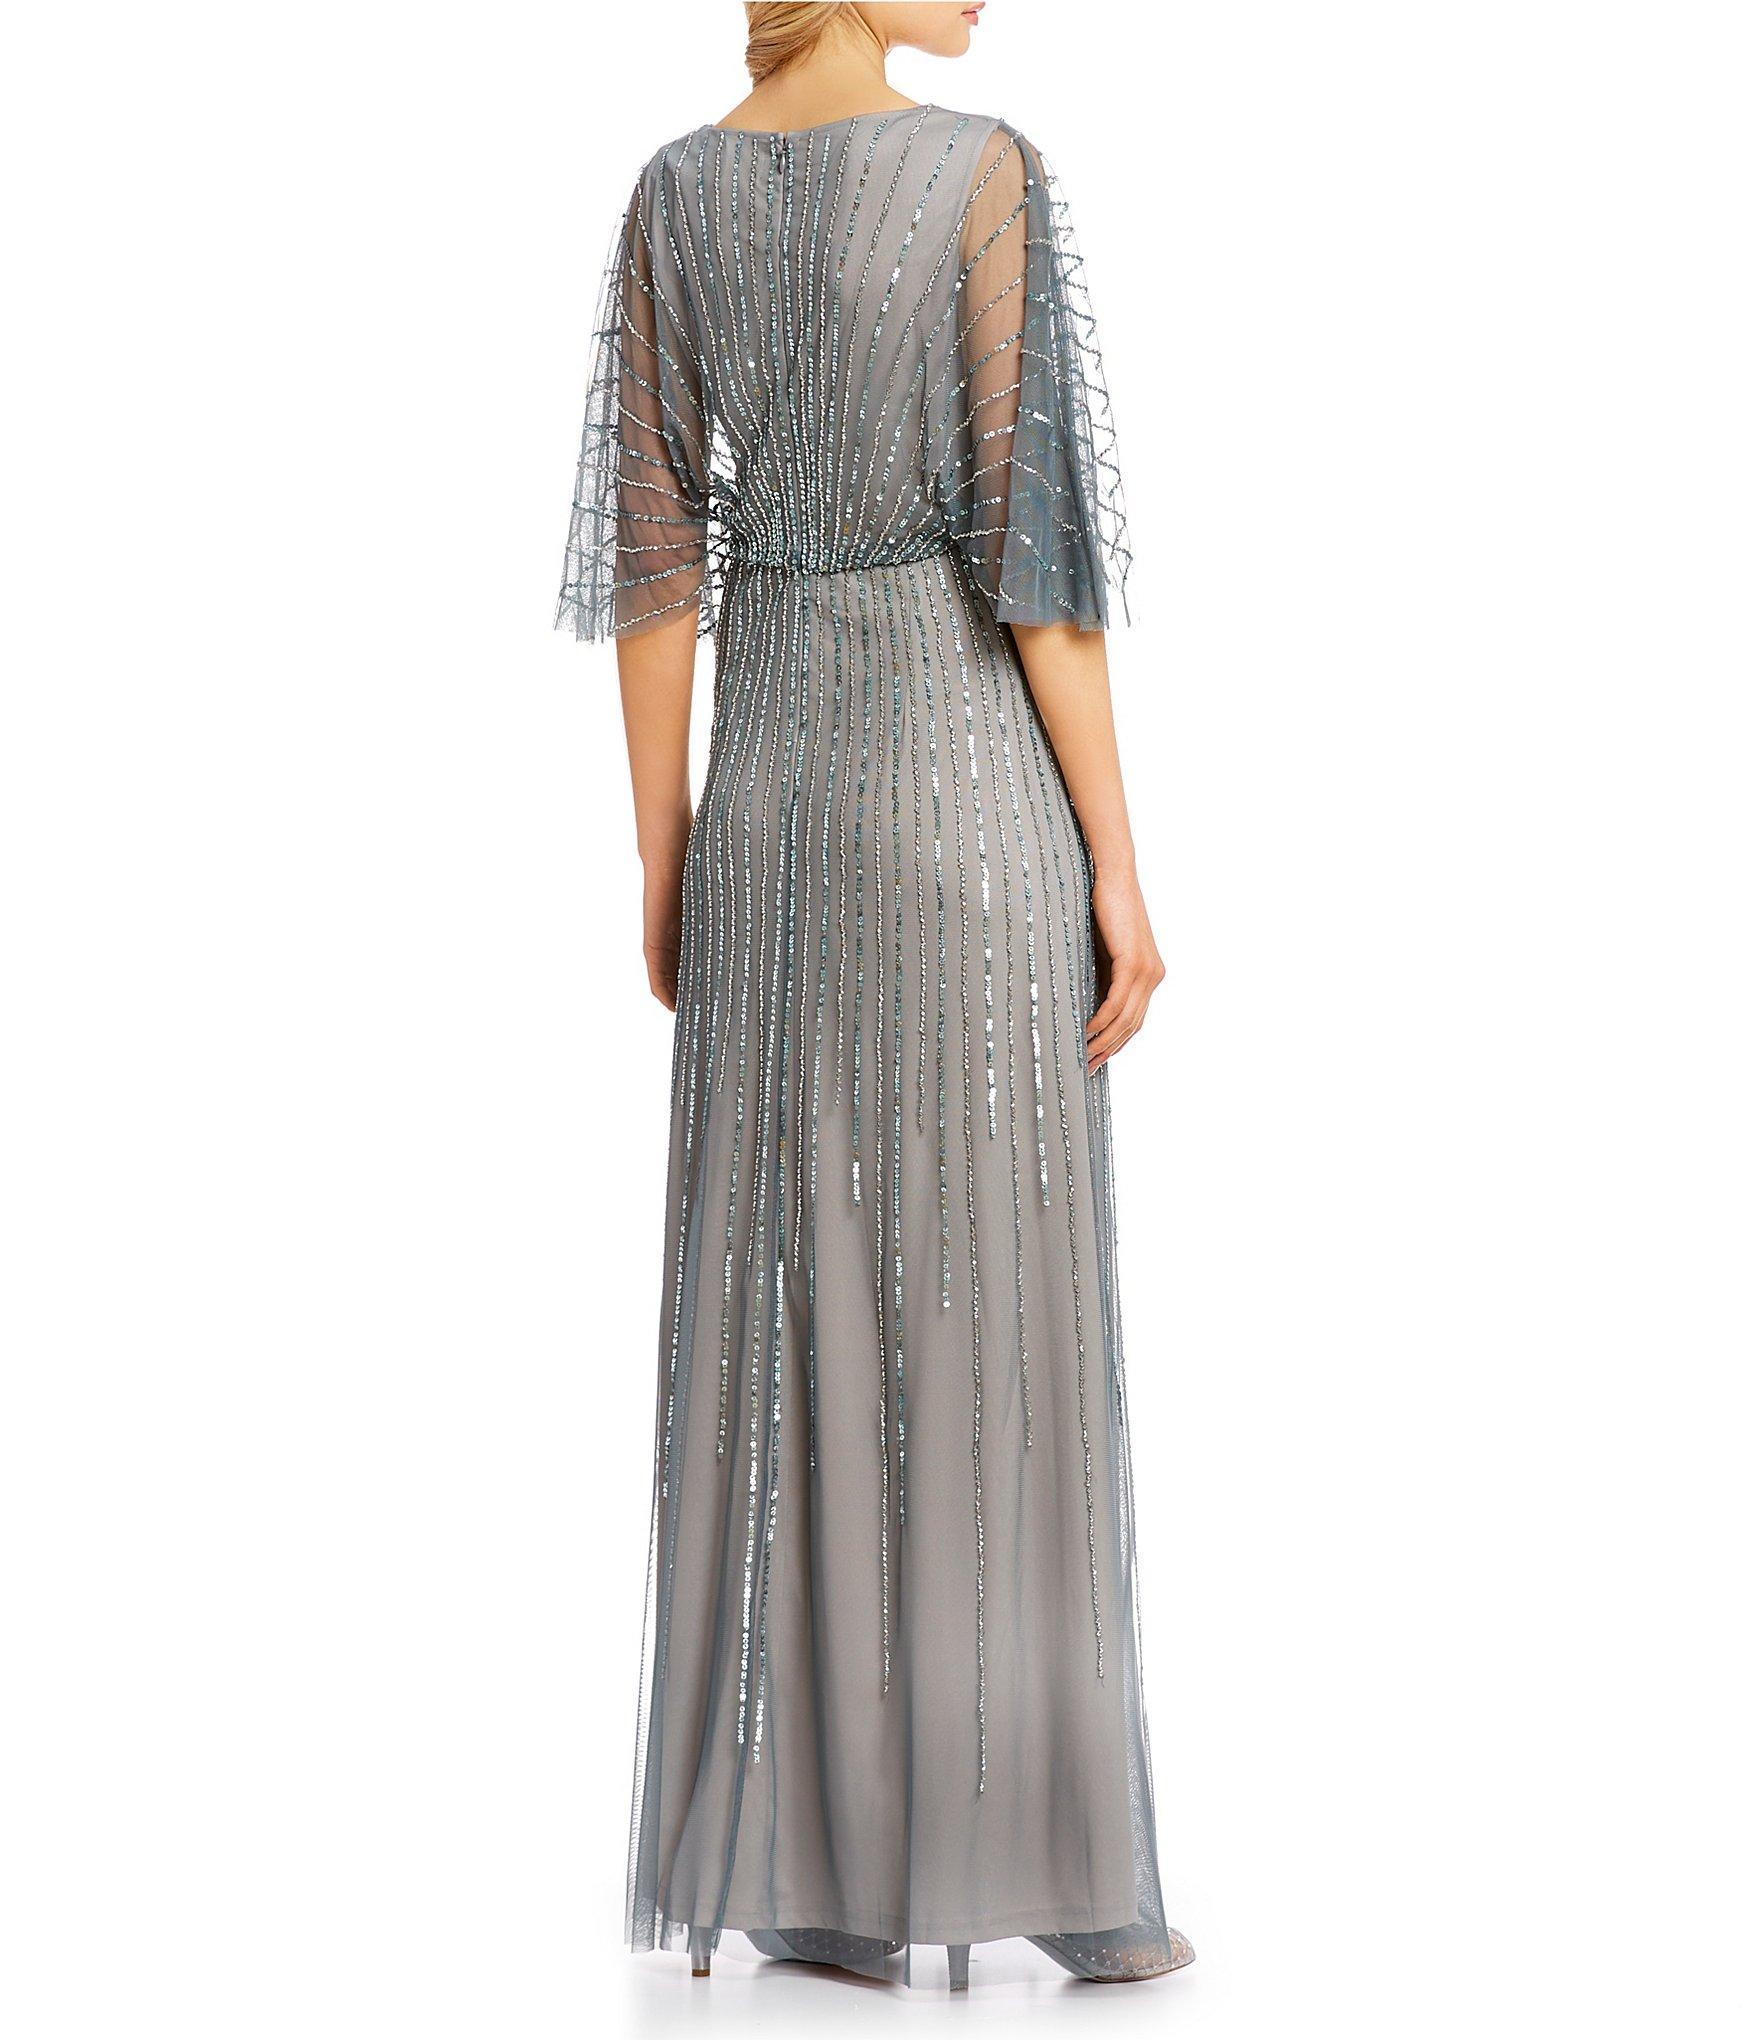 15650d639c97 Adrianna Papell - Metallic Adrianna V-neck Beaded Blouson Illusion 3/4  Sleeves Gown. View fullscreen